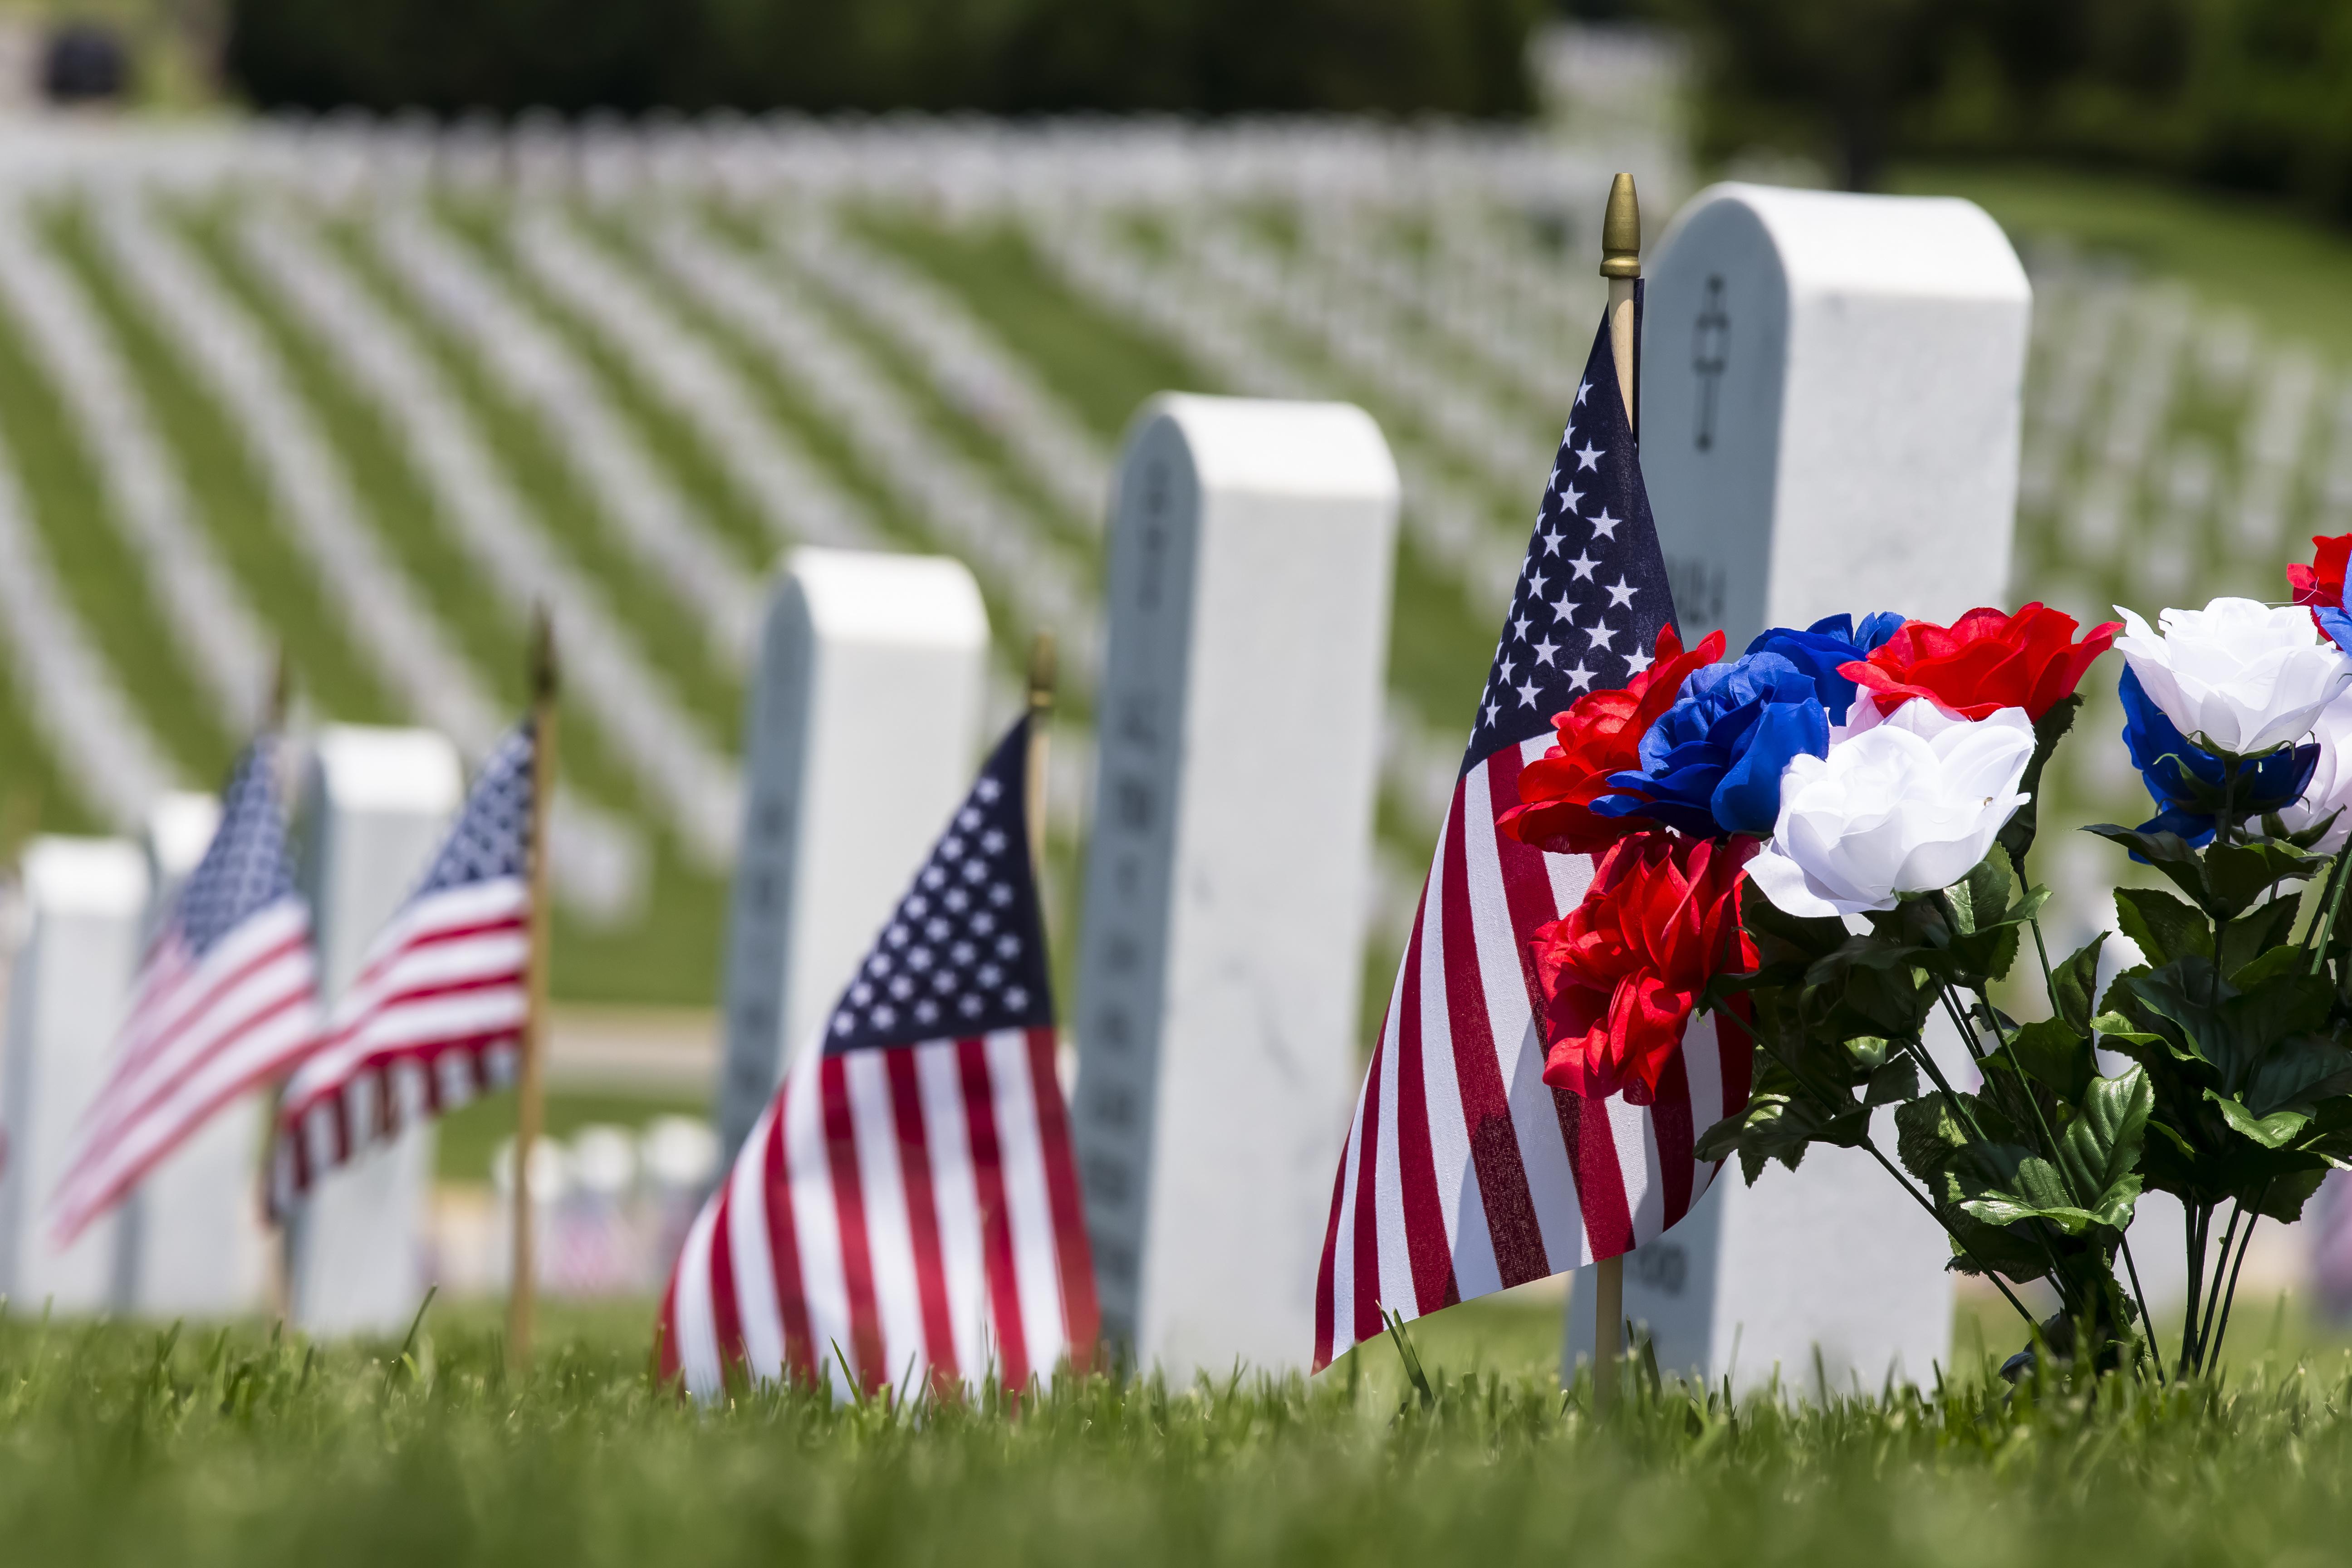 American flags decorate veterans' graves for Memorial Day.